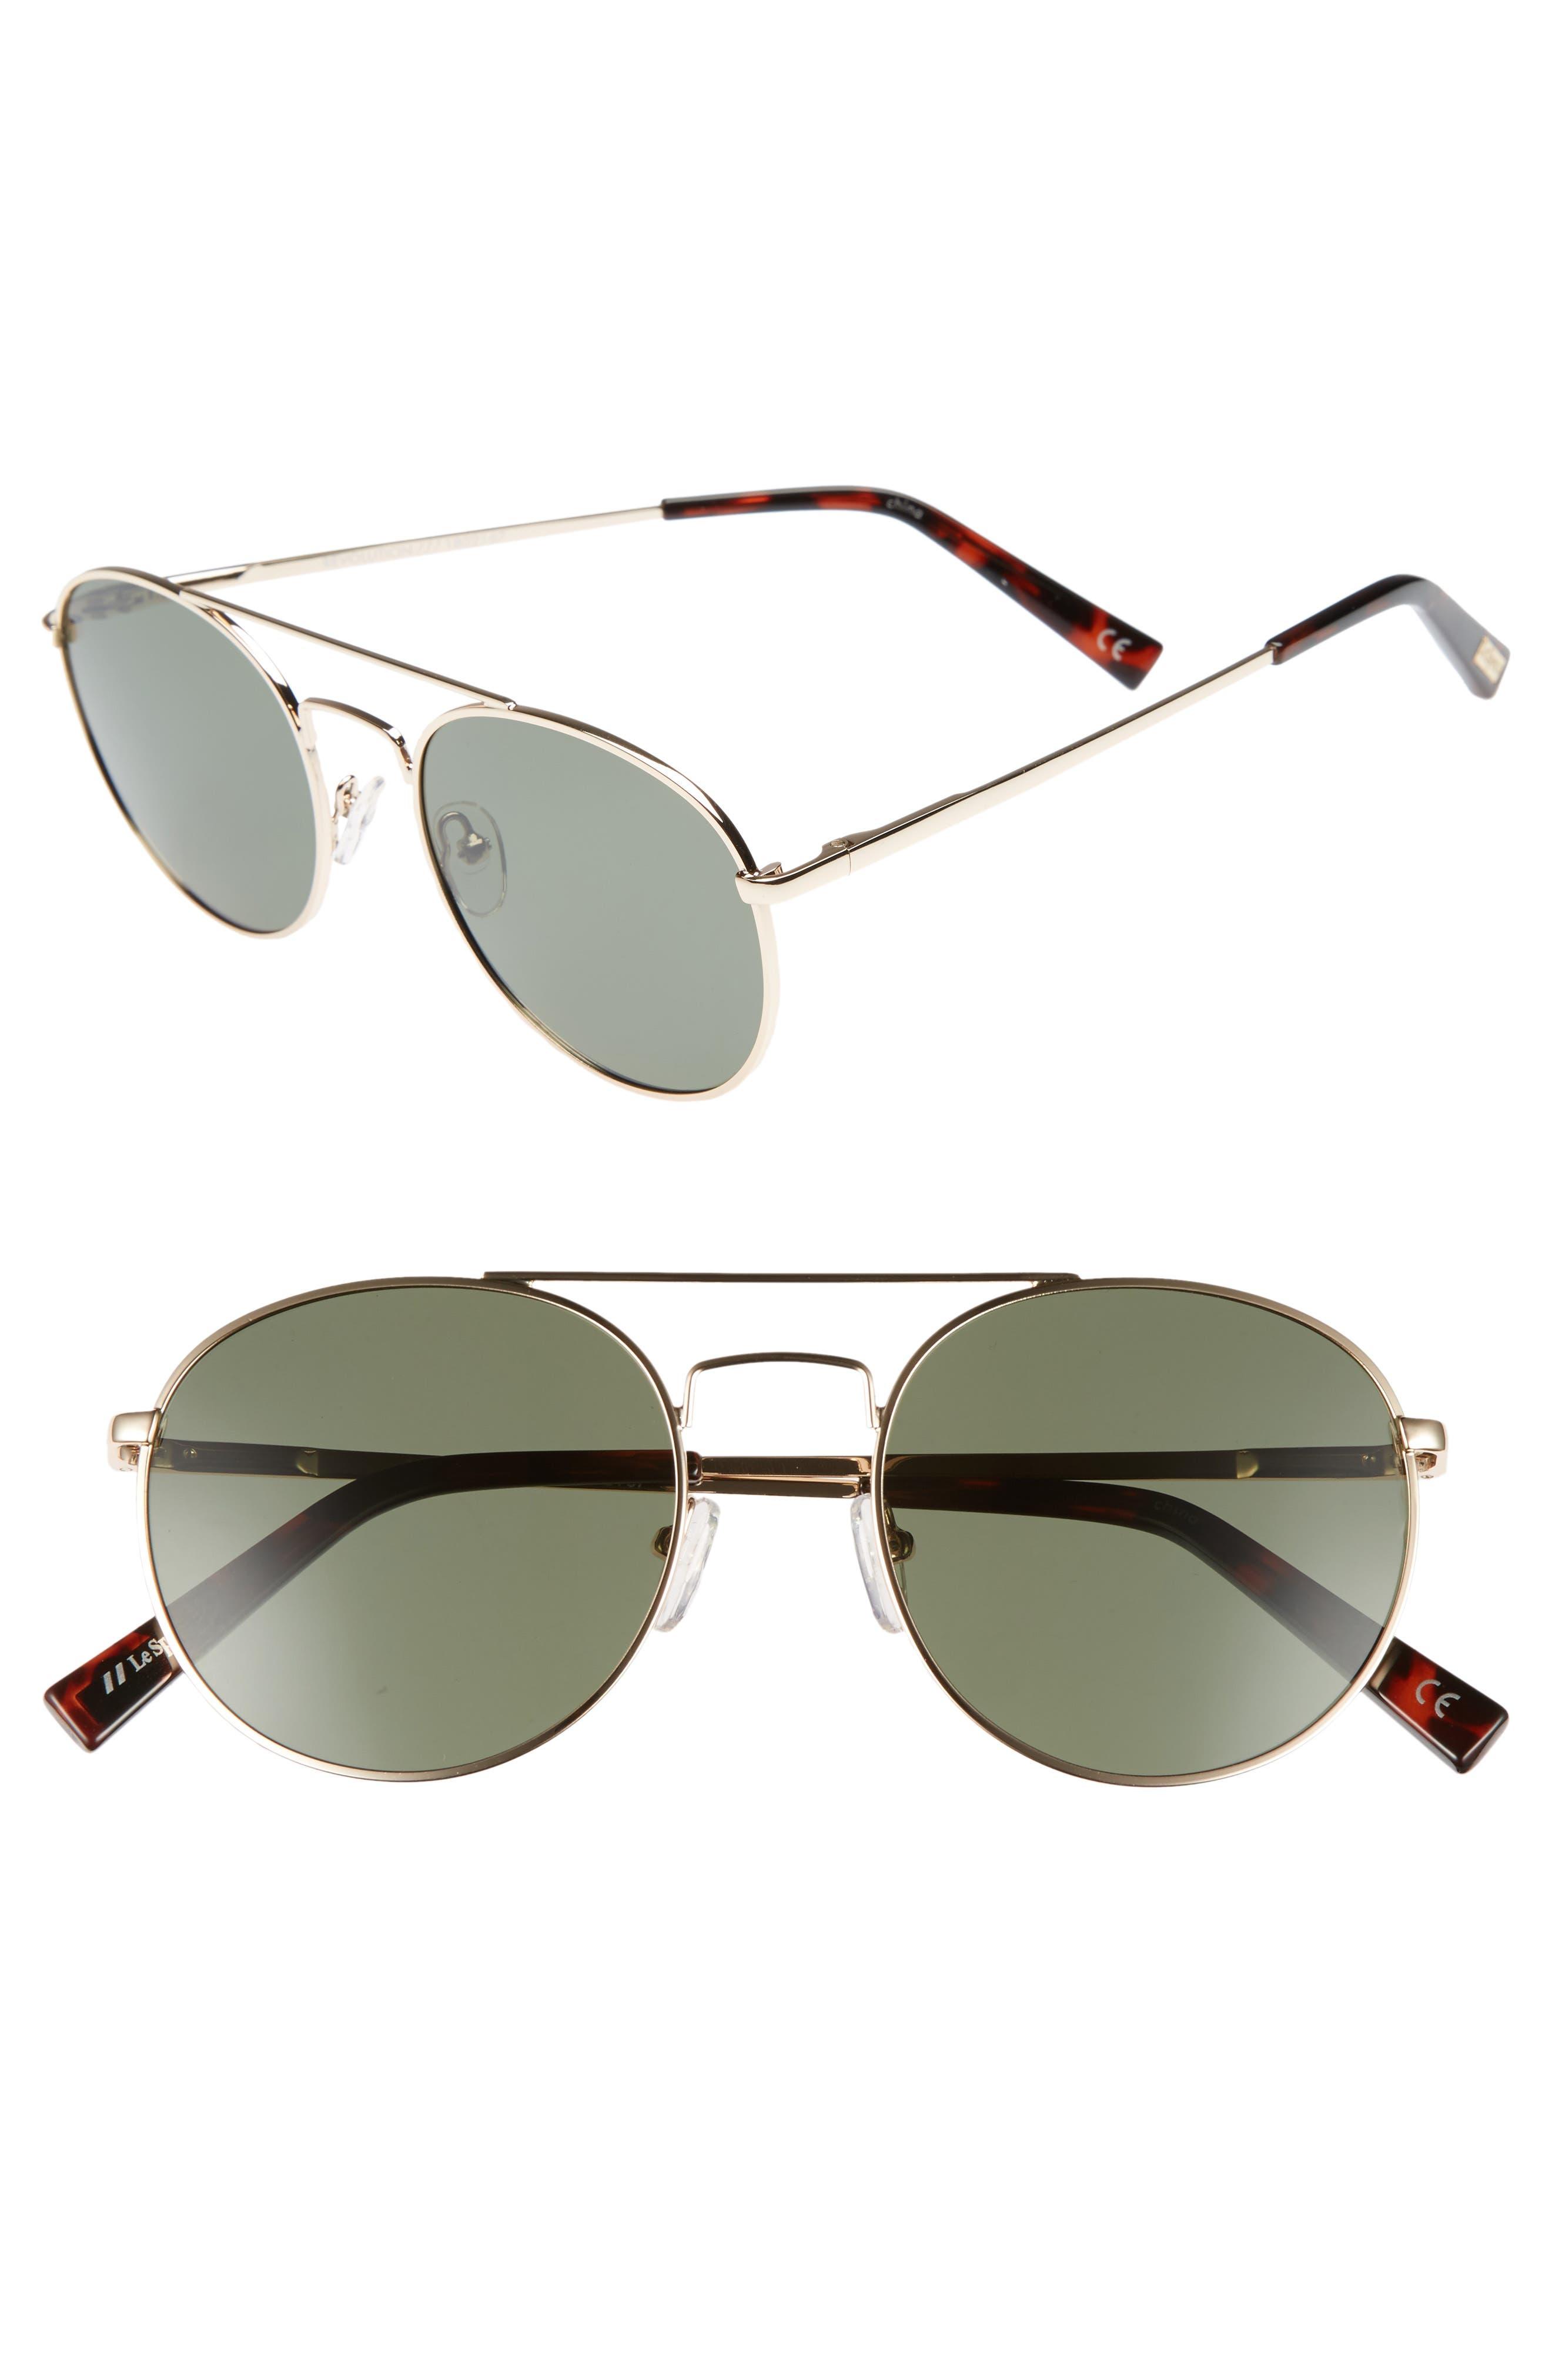 Revolution 53mm Aviator Sunglasses,                             Main thumbnail 1, color,                             GOLD